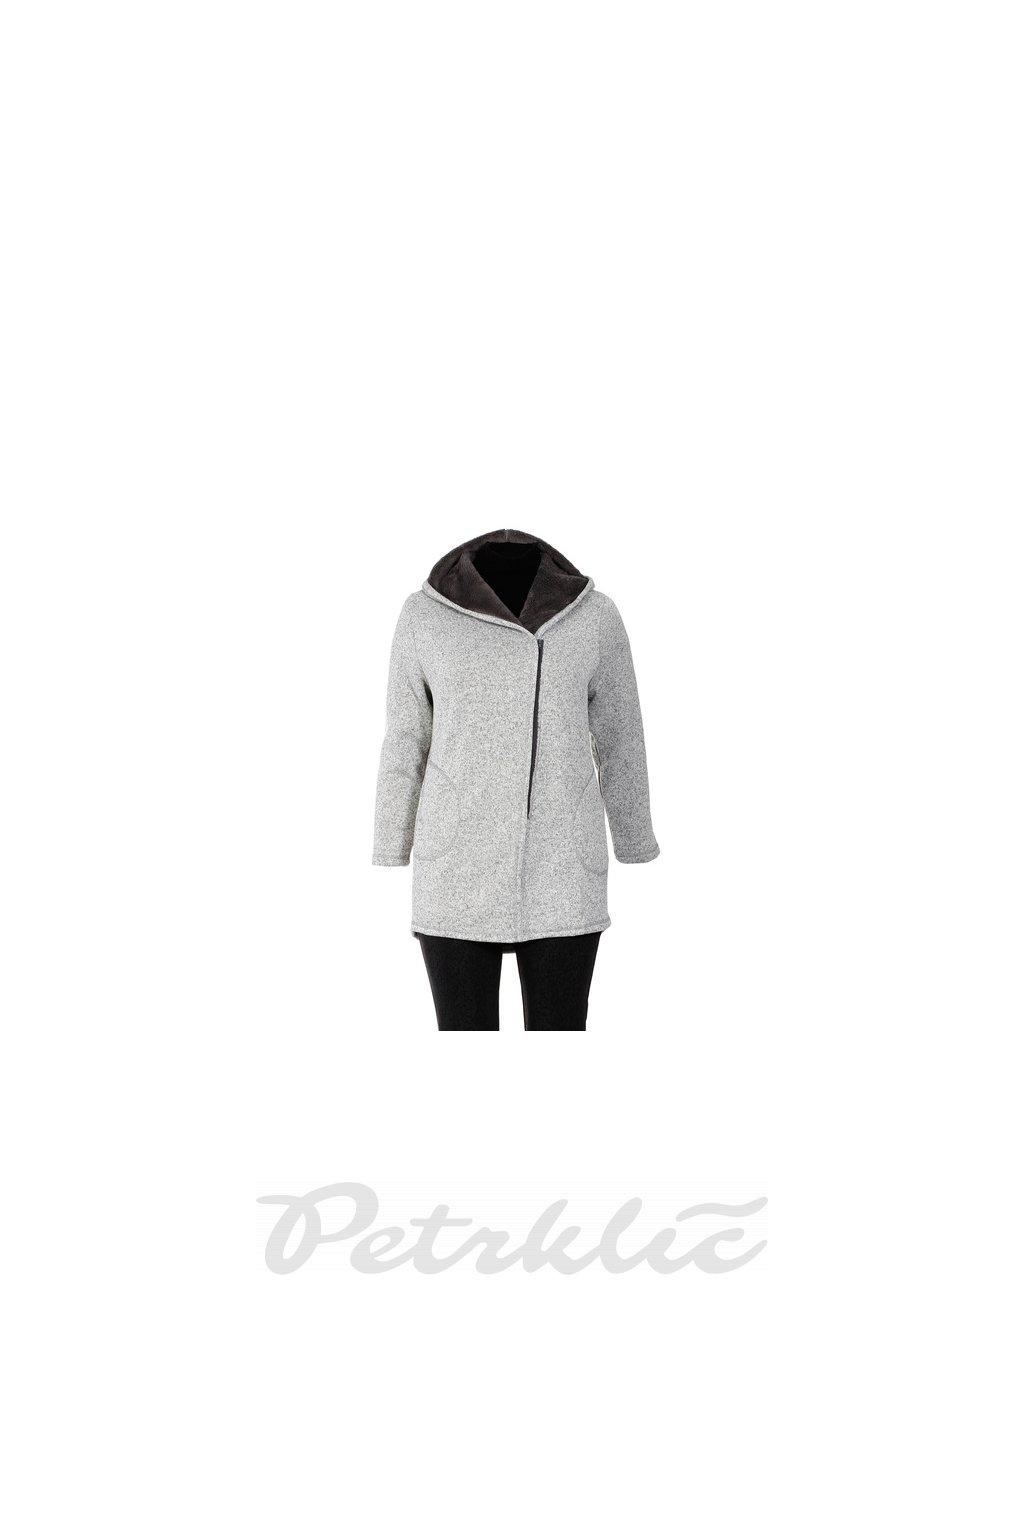 Melírovaný kabátek s kapucí sv. šedá + tm. šedá